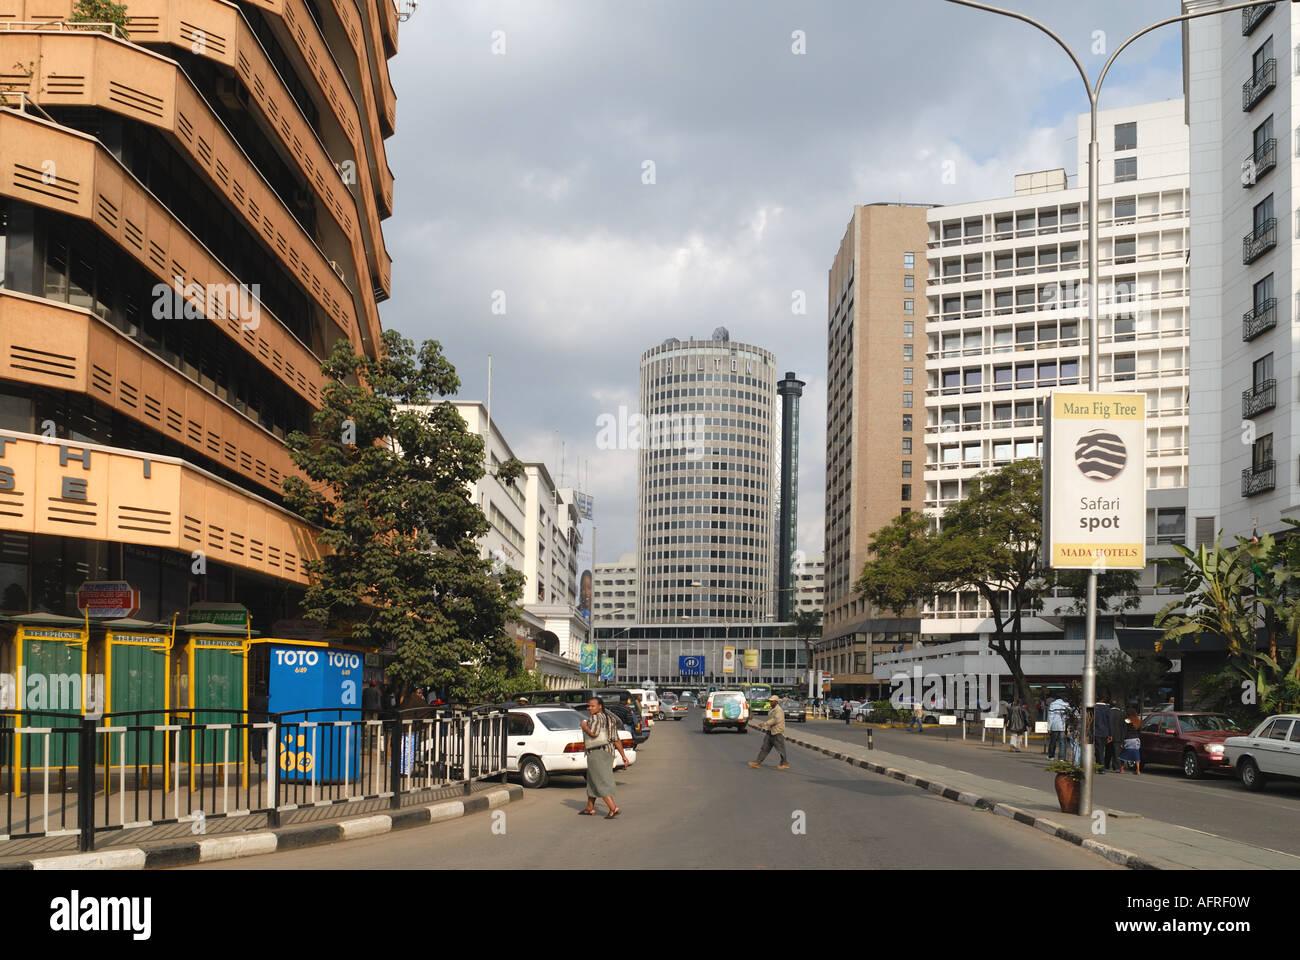 Kimathi Street Nairobi Kenya East Africa The Hilton International Hotel is at the end of the street - Stock Image